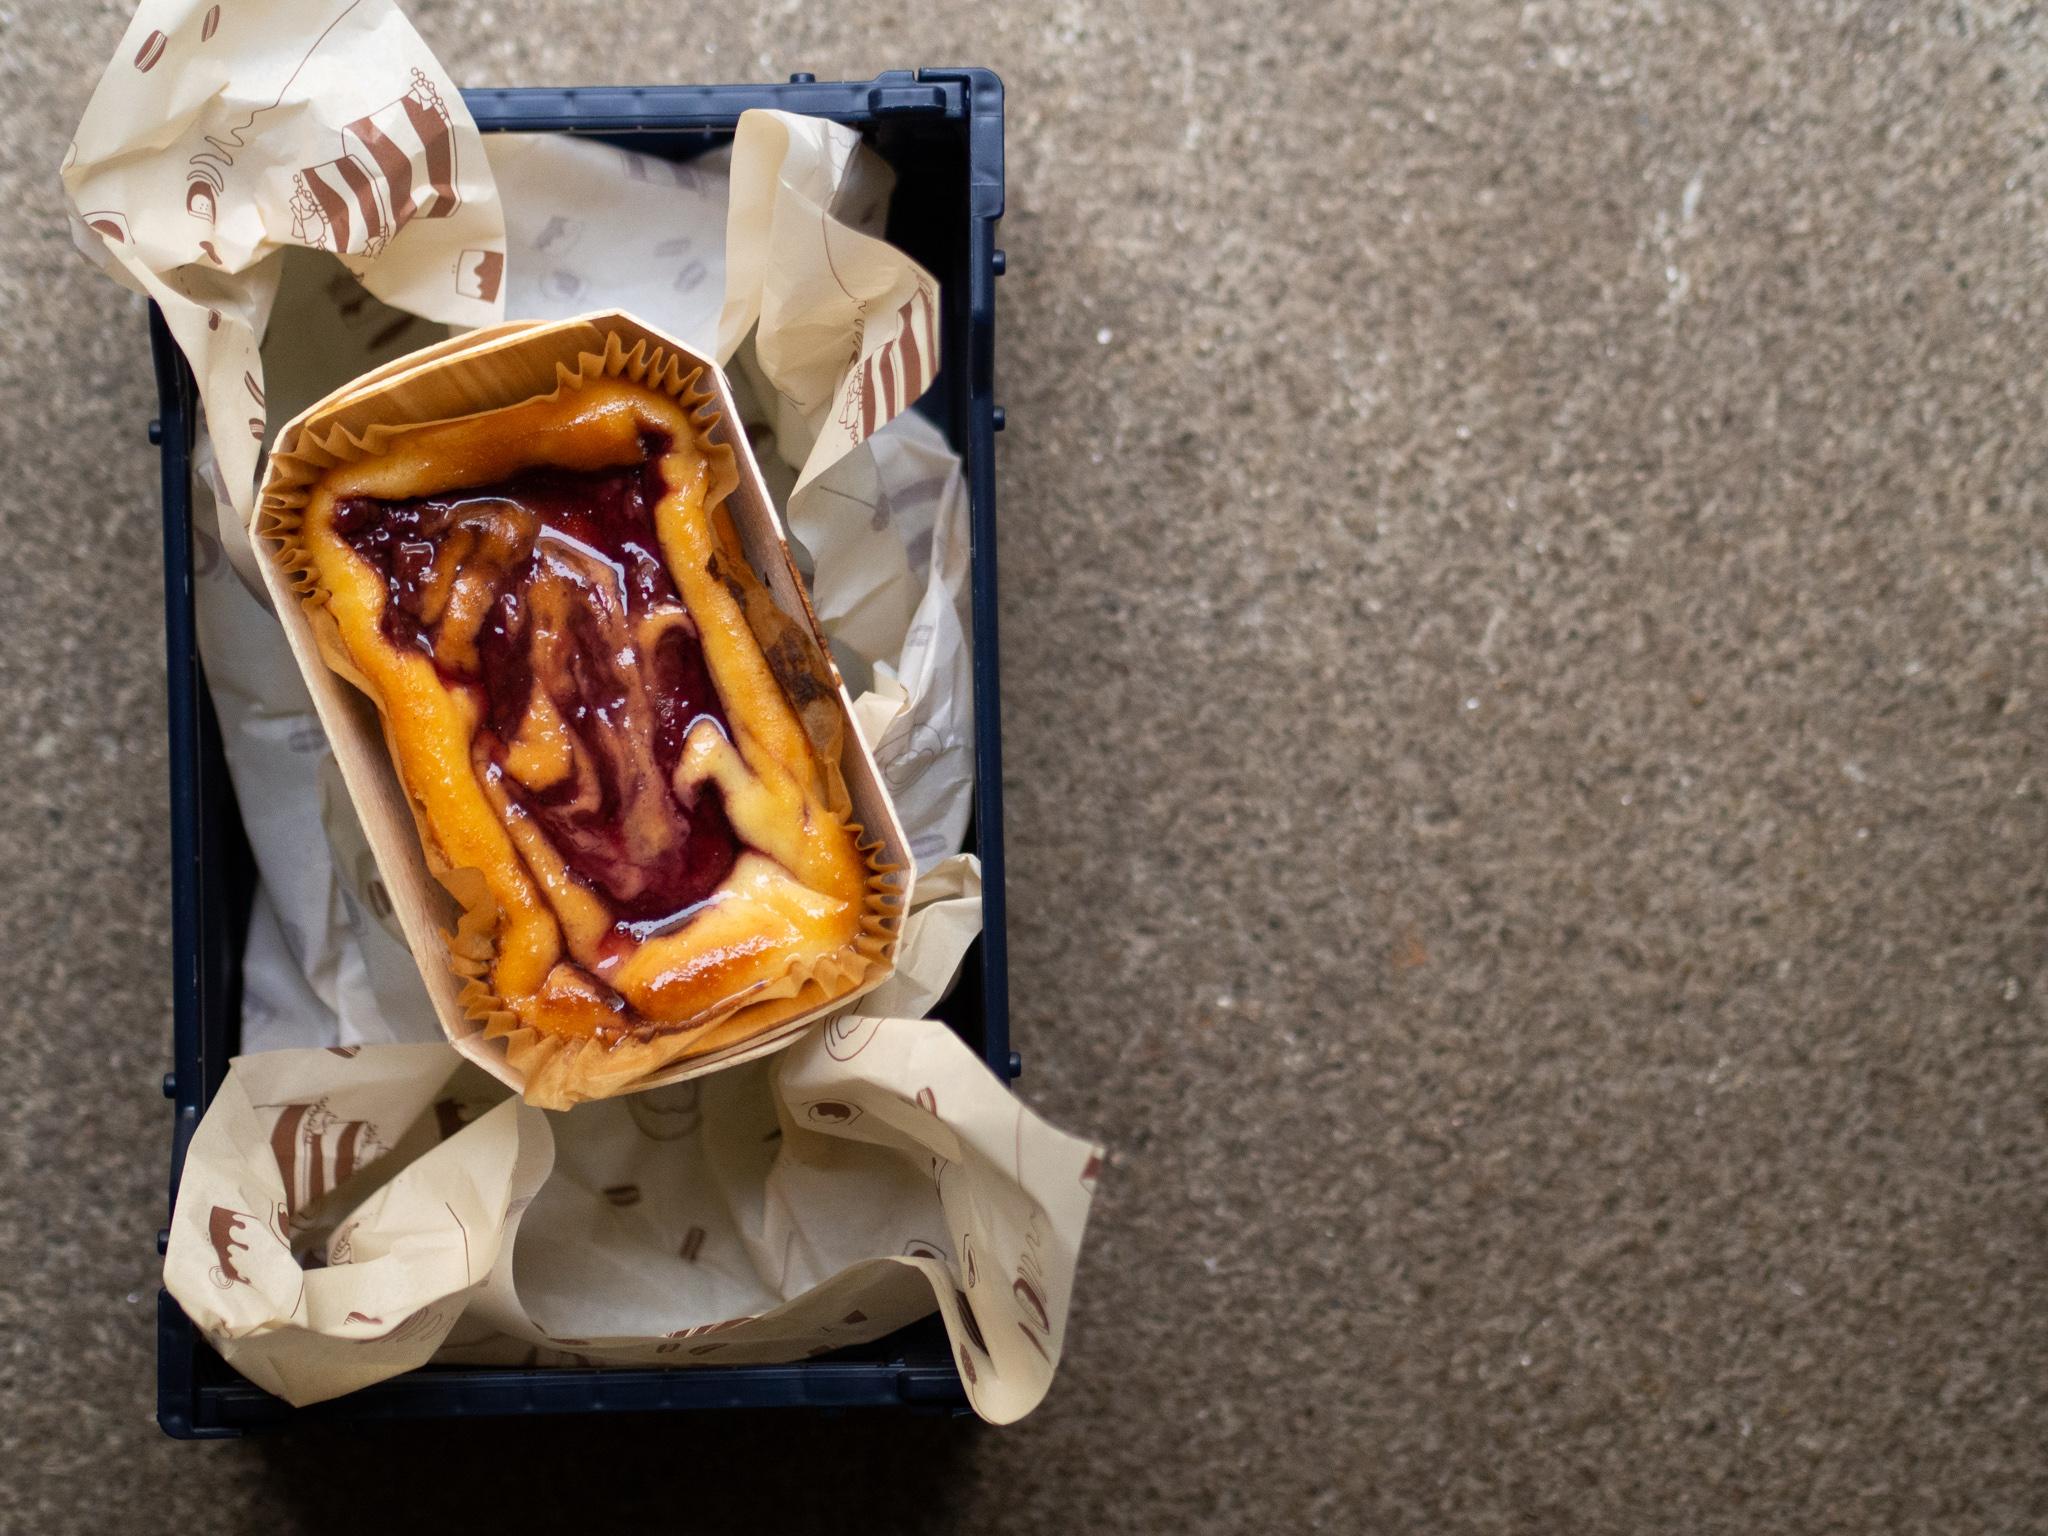 Cheesecake mit Macadamia Crumble und Himbeer - 320-330 Gramm